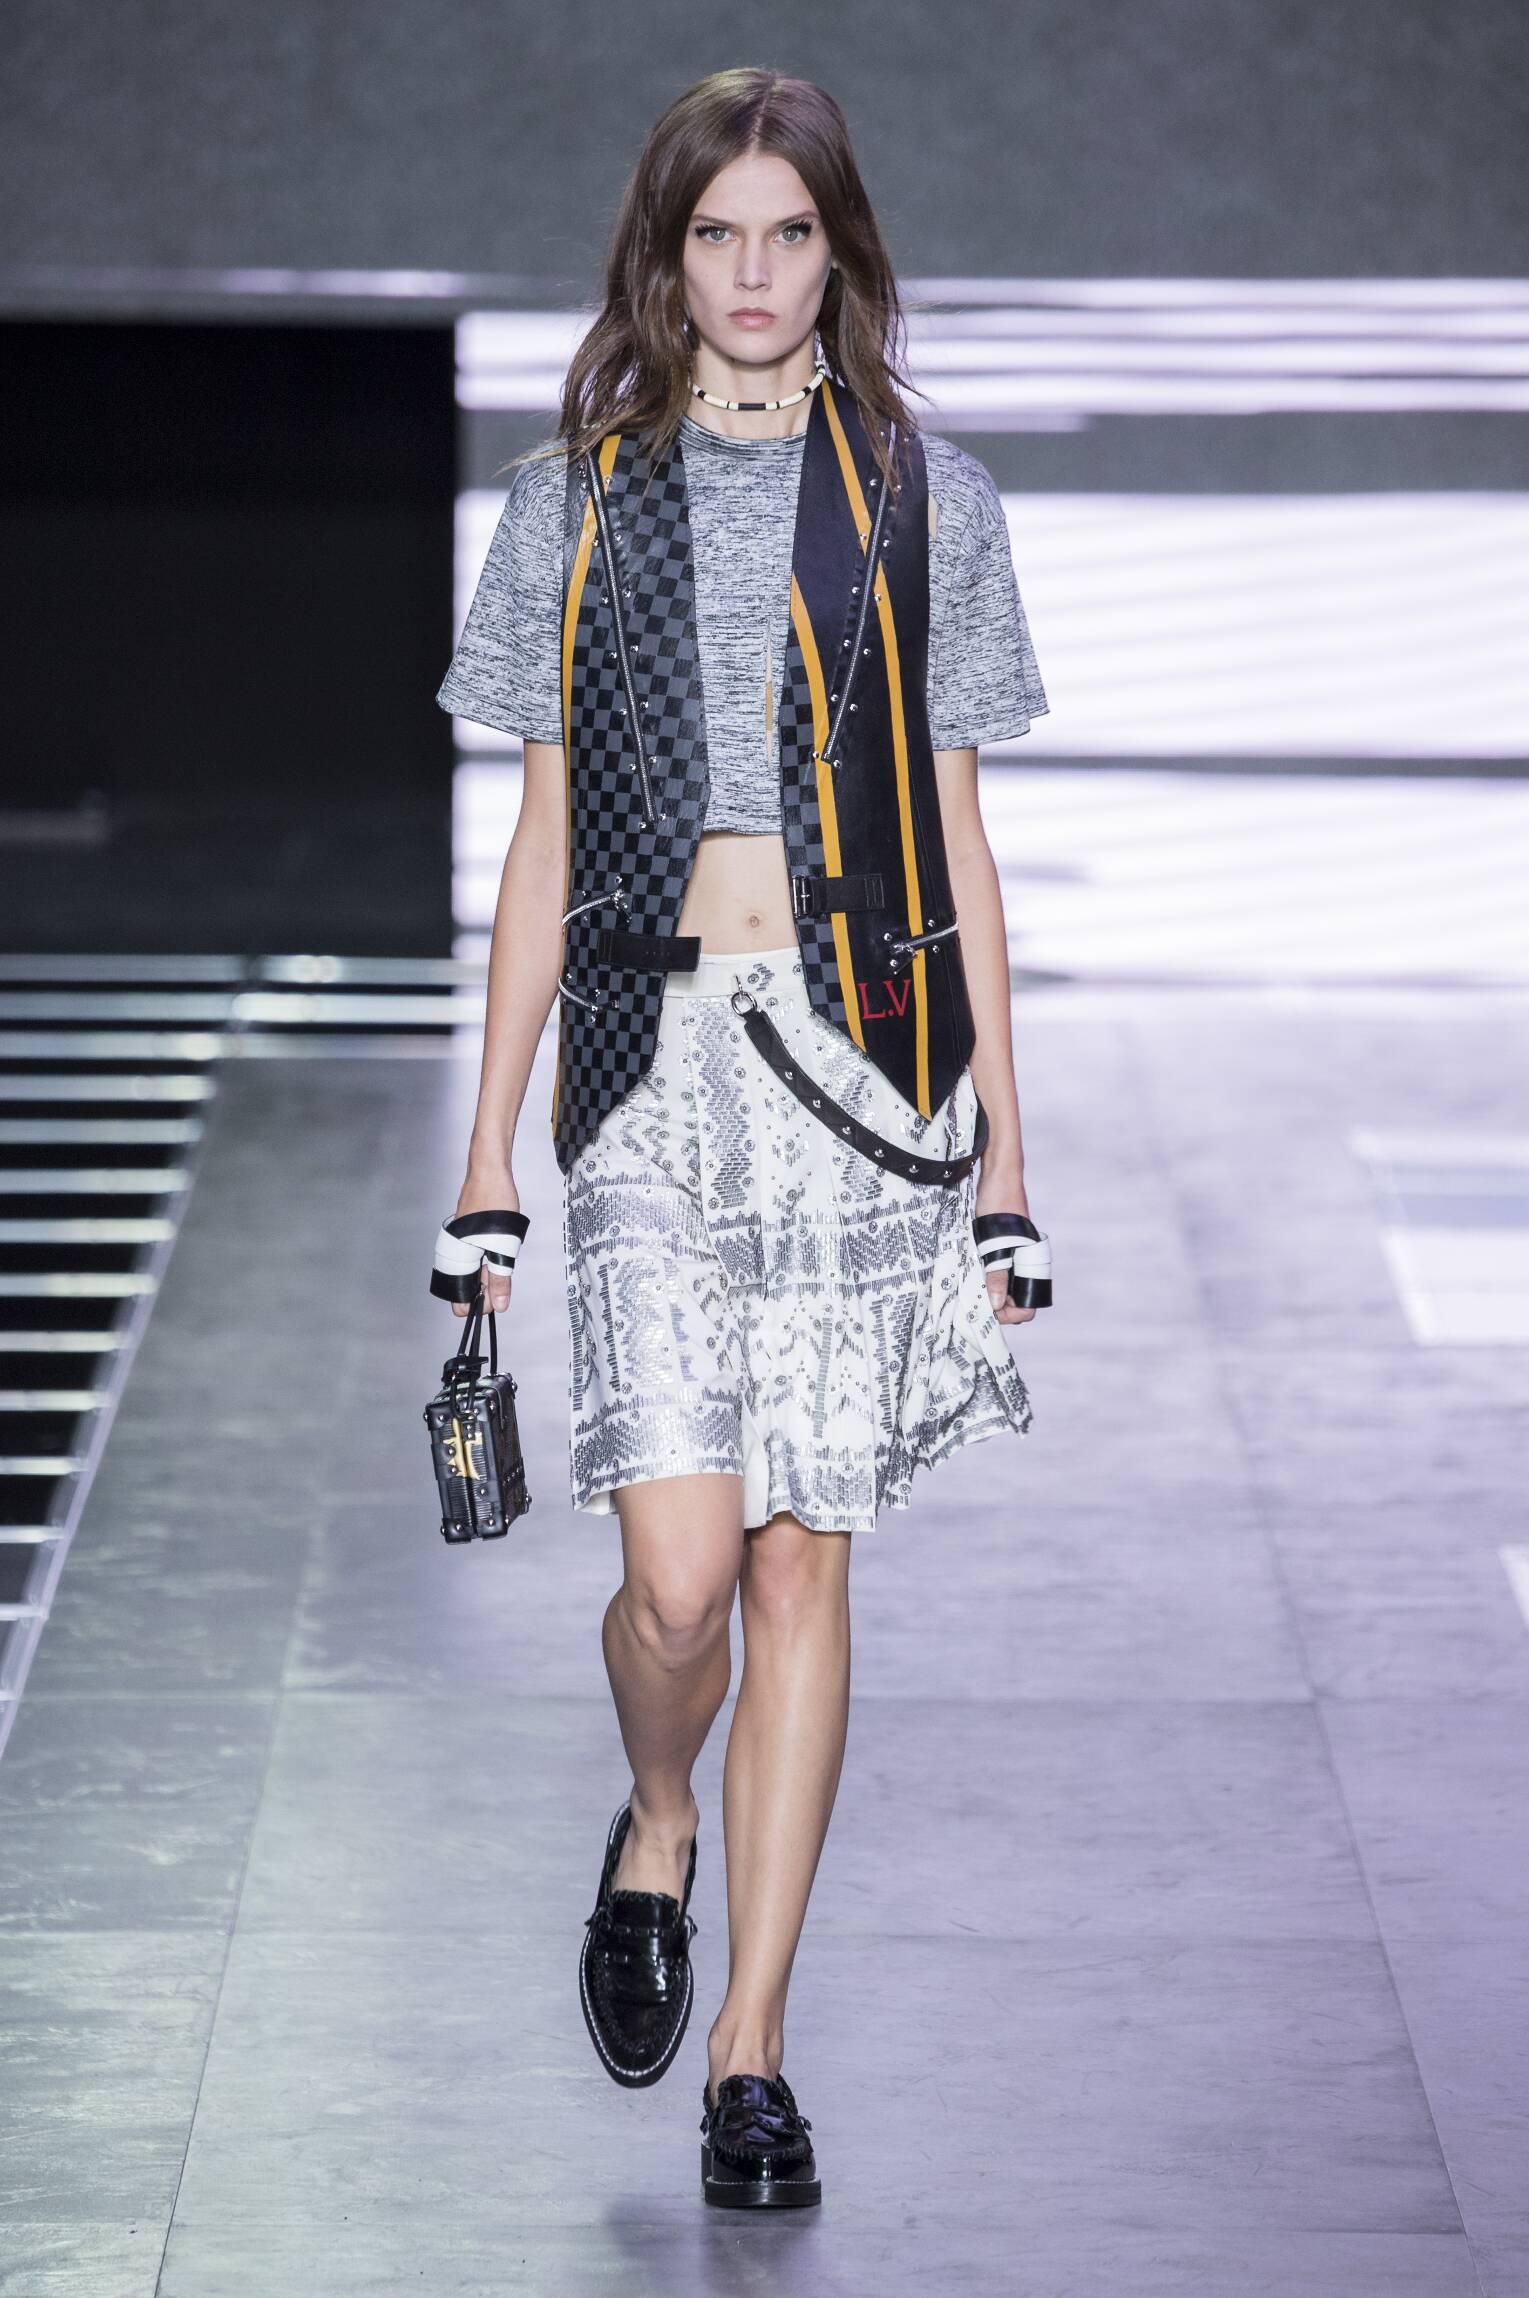 Fashion Model Louis Vuitton Catwalk